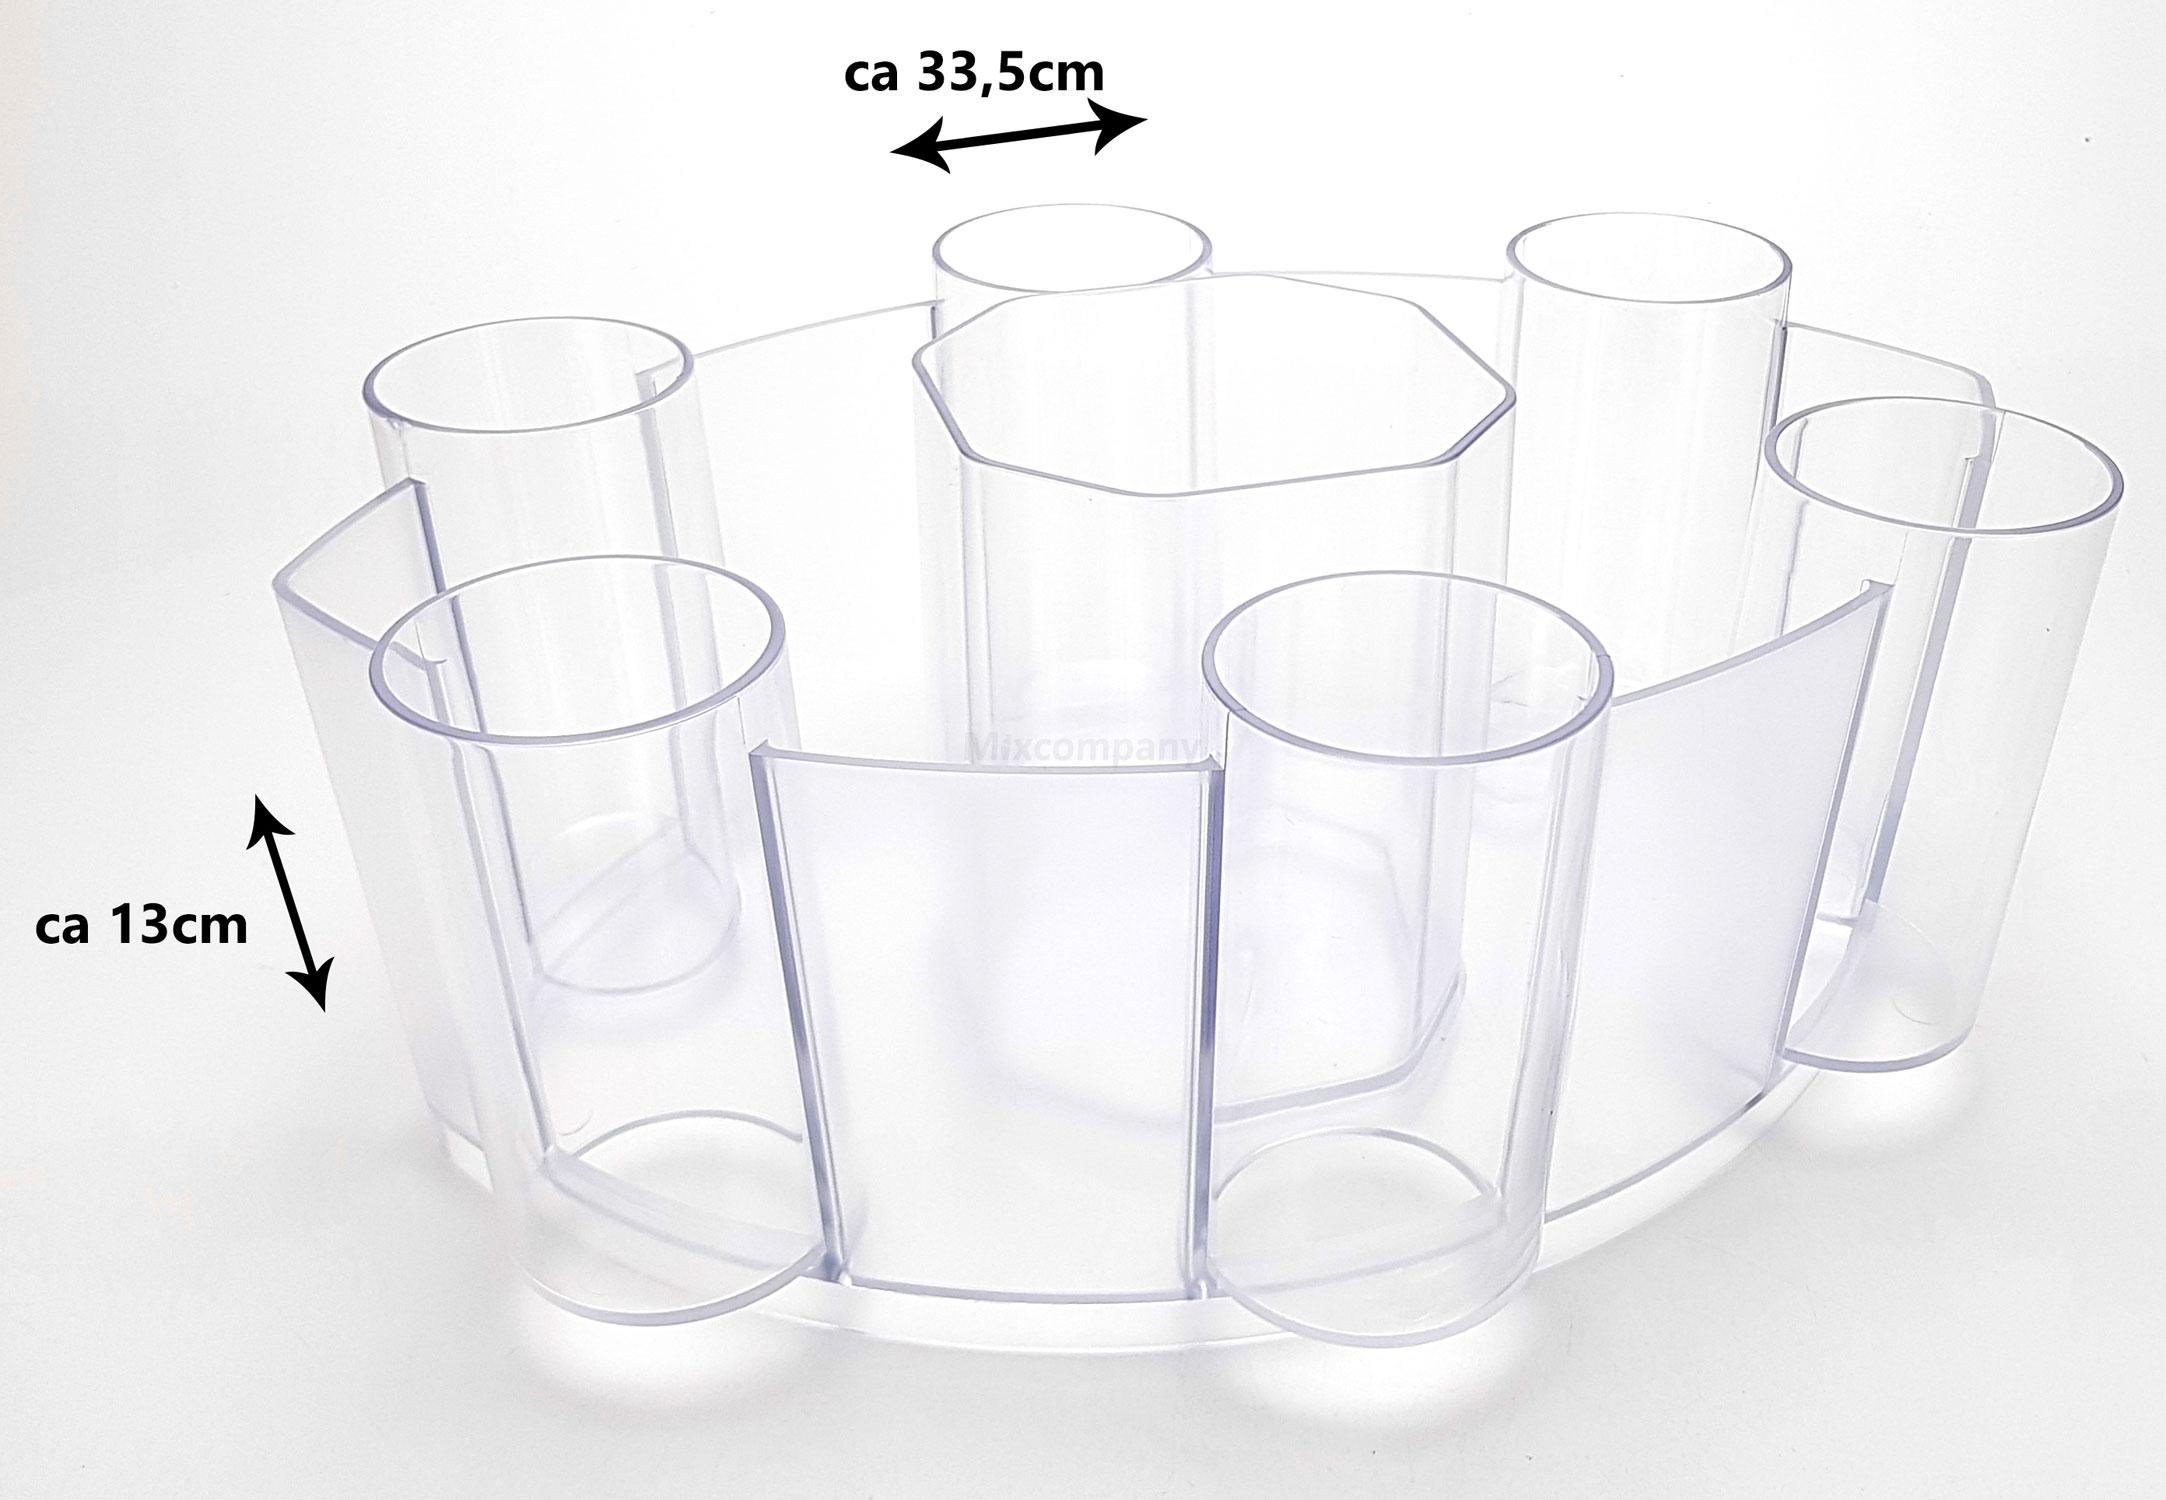 Dosenkühler Flaschenkühler Eiskühler Eiskübel Bar Kühler - groß 6 Dosen